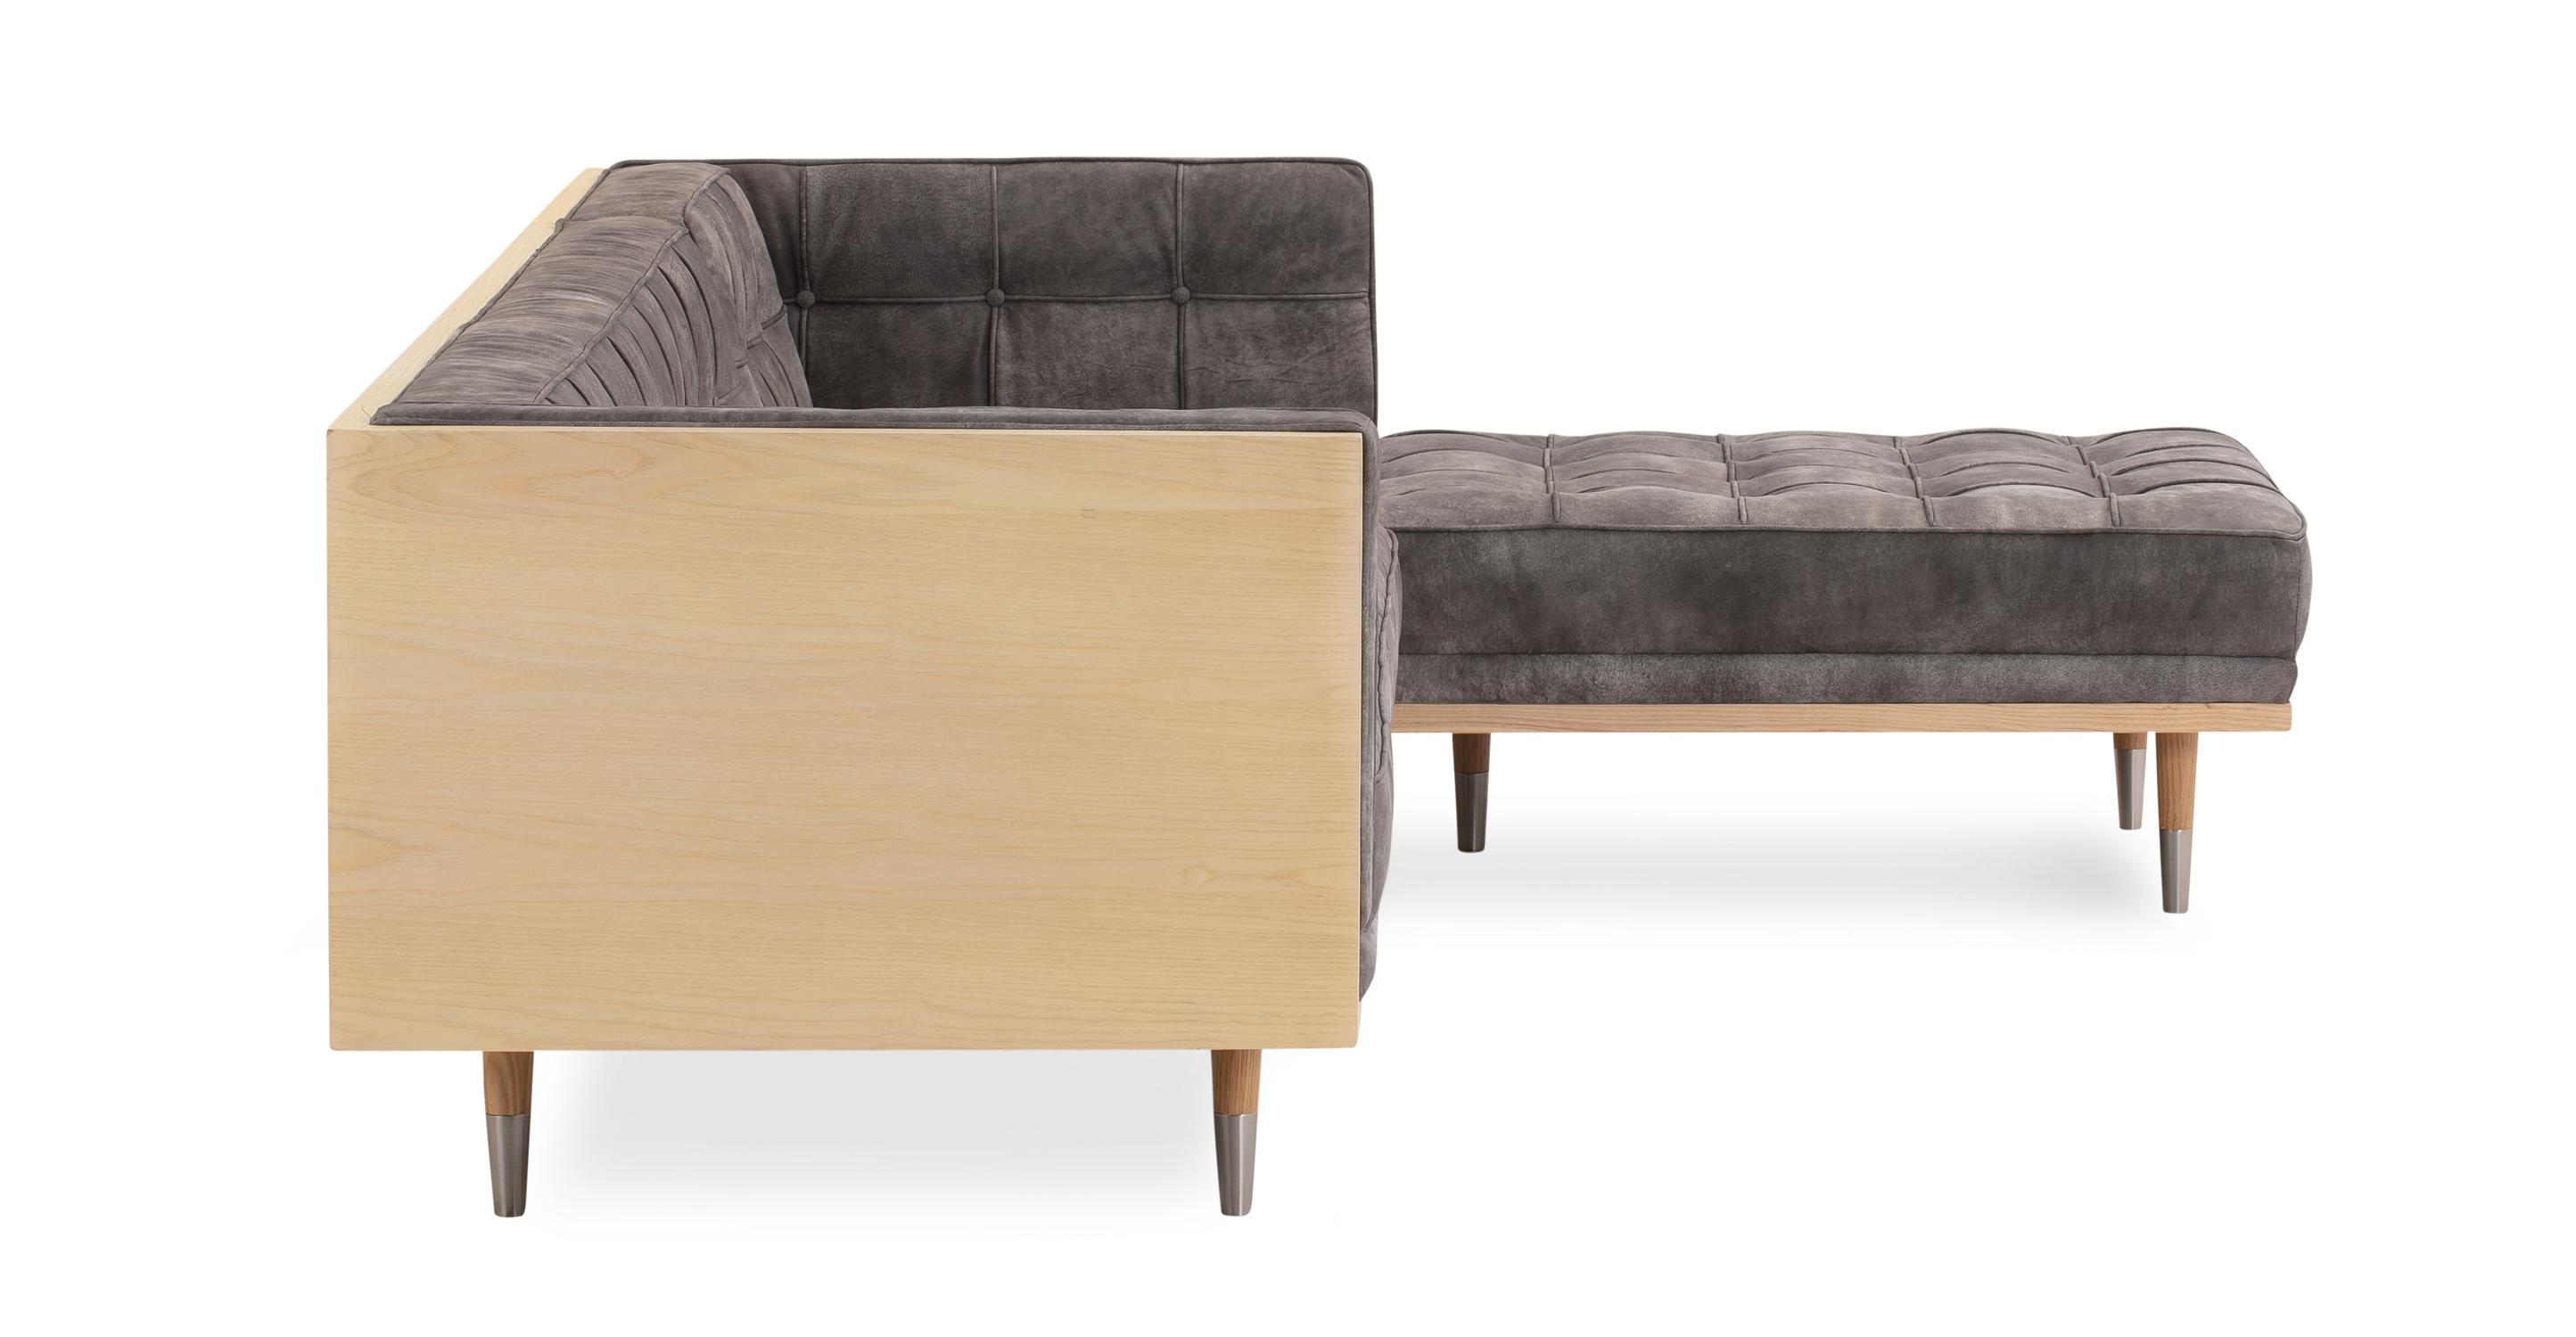 Woodrow Box Sofa Sectional Right, Ash/Elefante Full Grain Aniline